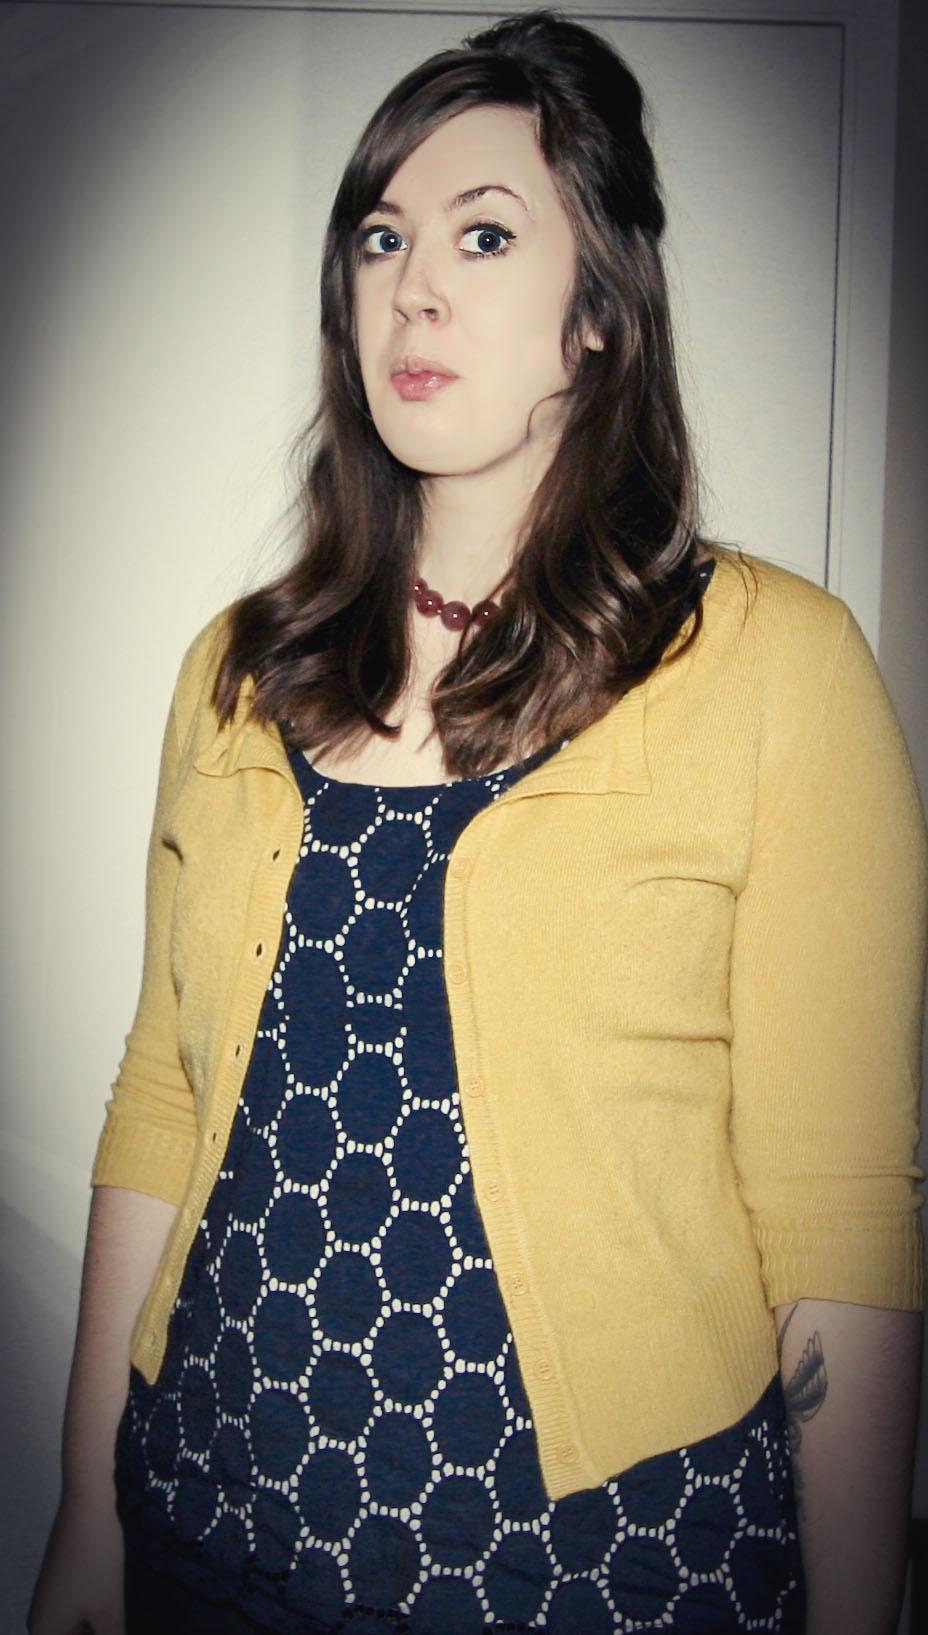 Blue Top & Yellow Cardigan